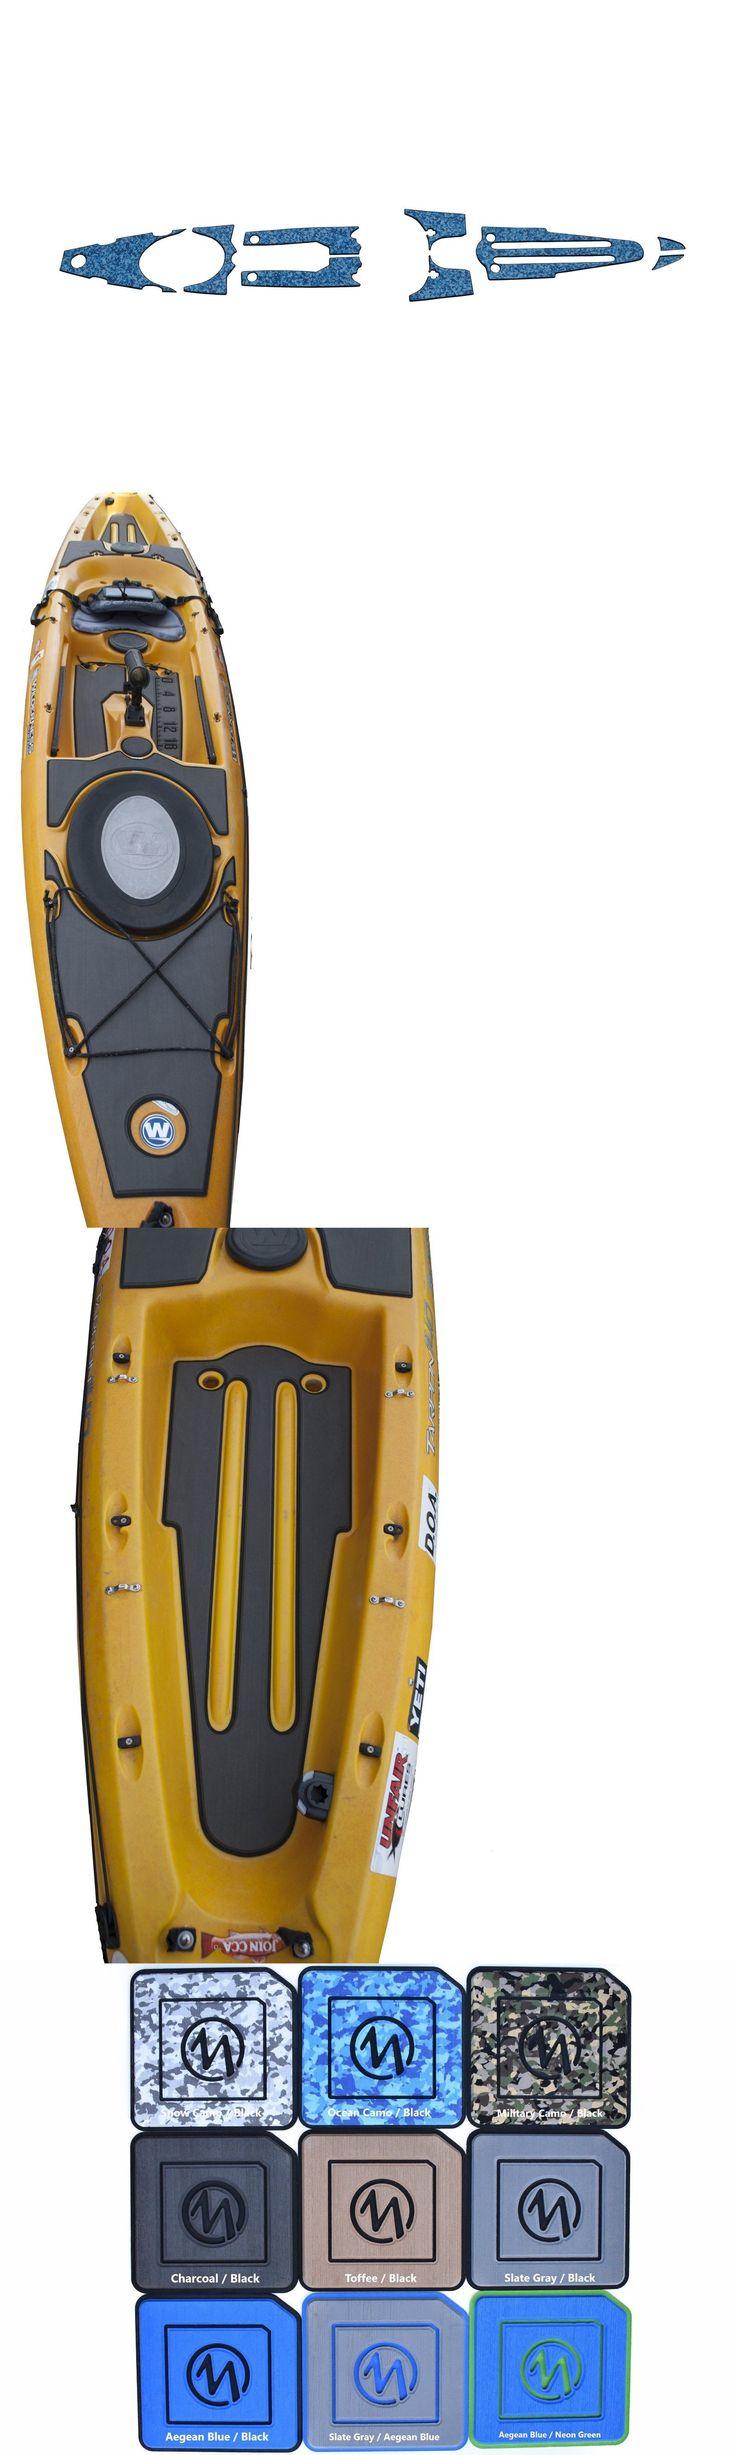 Kayaks 36122: Wilderness - Tarpon 140 Complete Elite Series Pads Kit (Ocean Camo Black) -> BUY IT NOW ONLY: $179.95 on eBay!